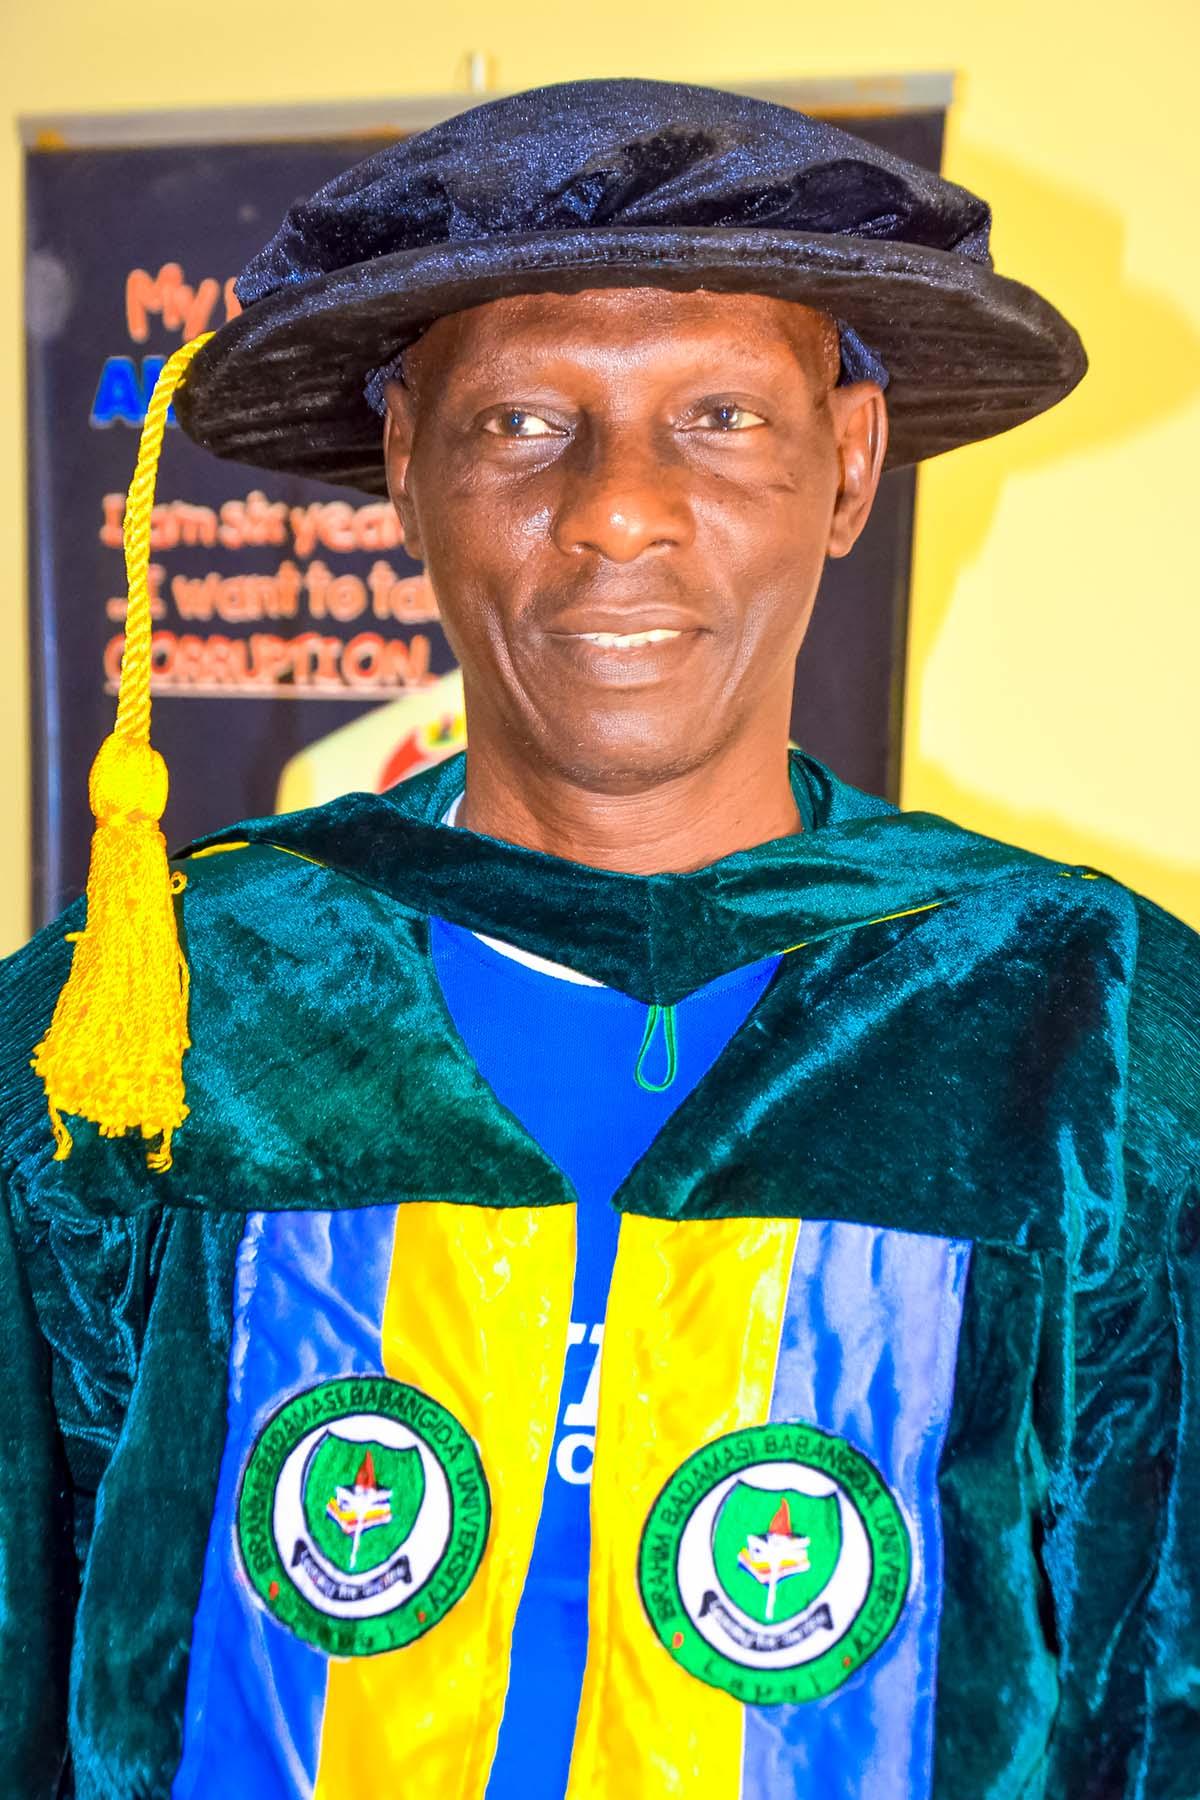 Dr. Olajide M. Folaranmi